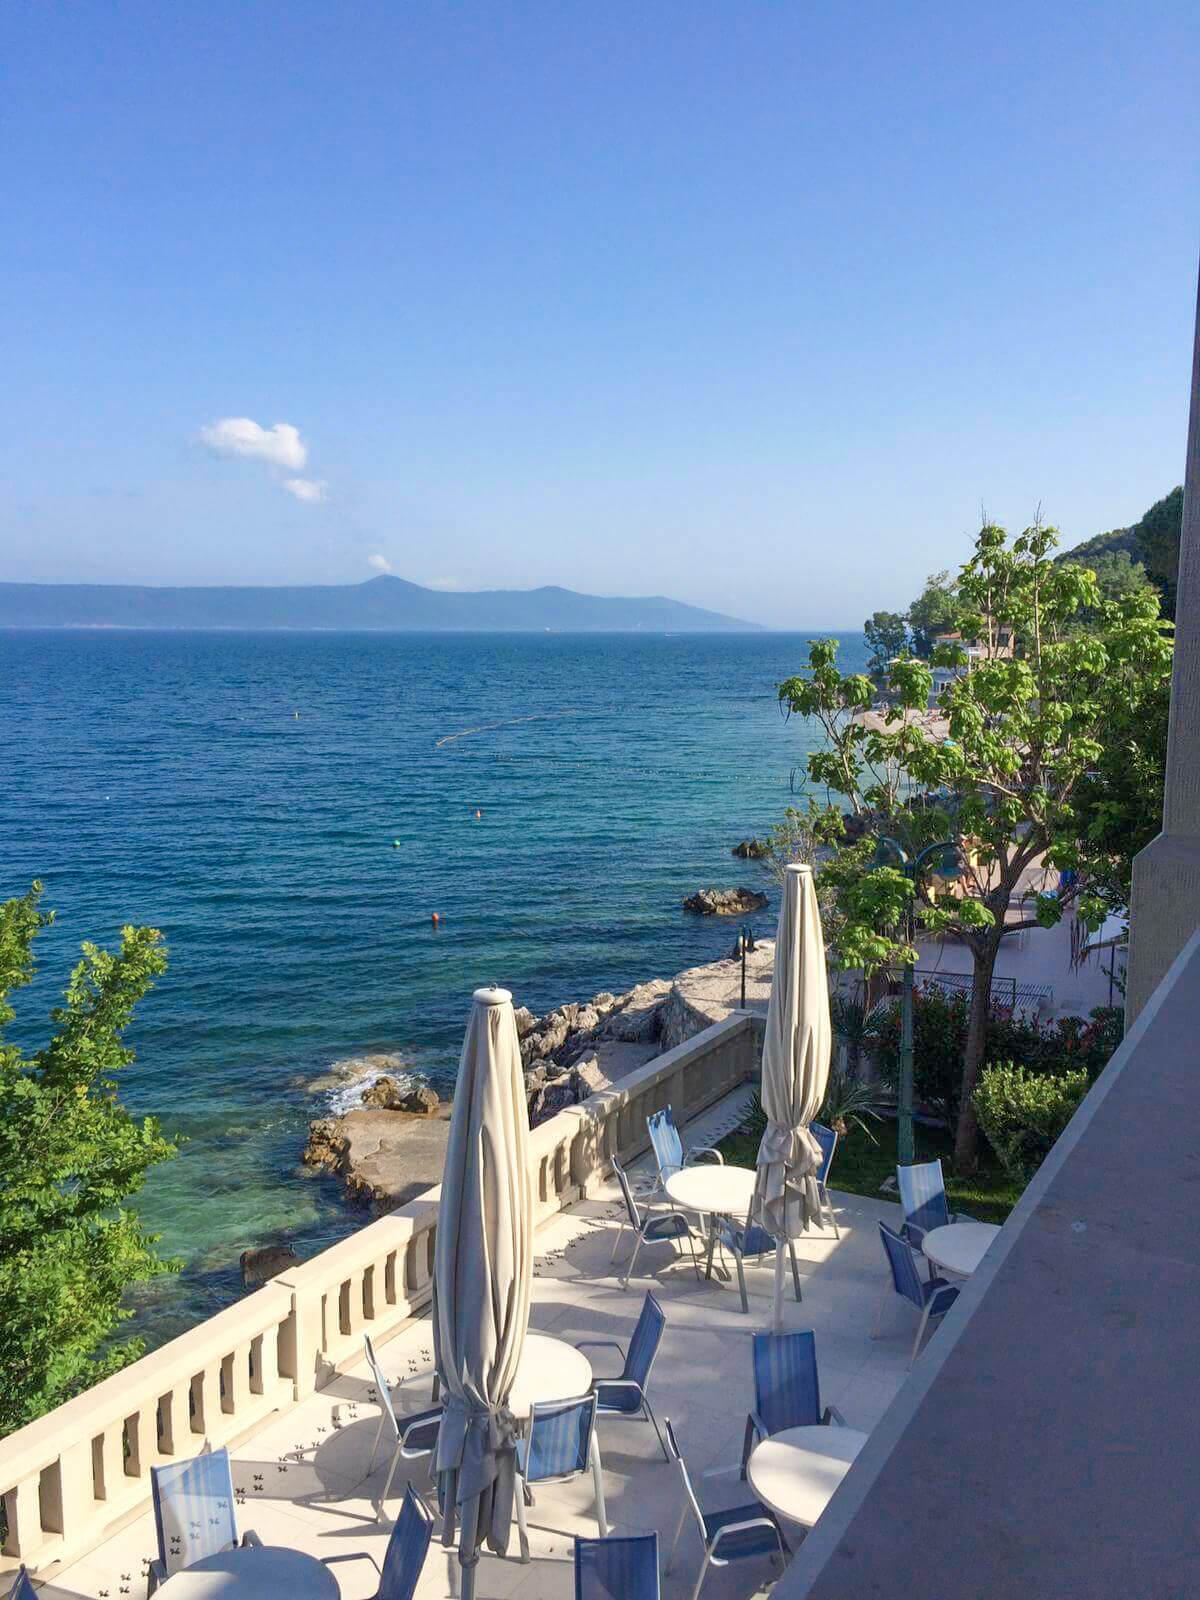 Meerblick vom Hotel